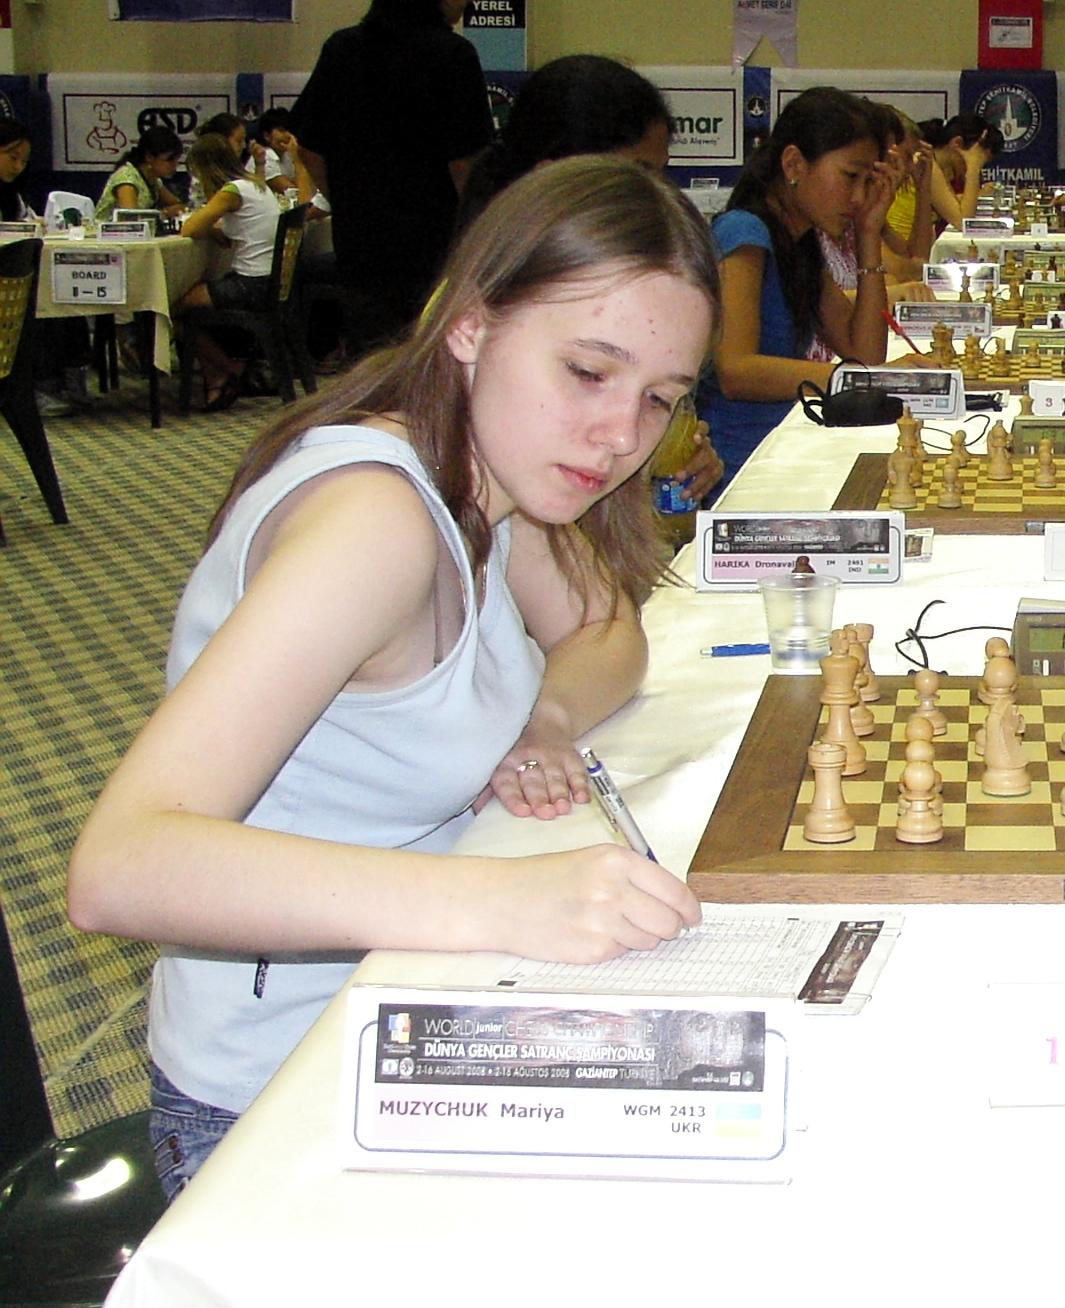 FileMariya Muzychukjpg Wikimedia Commons